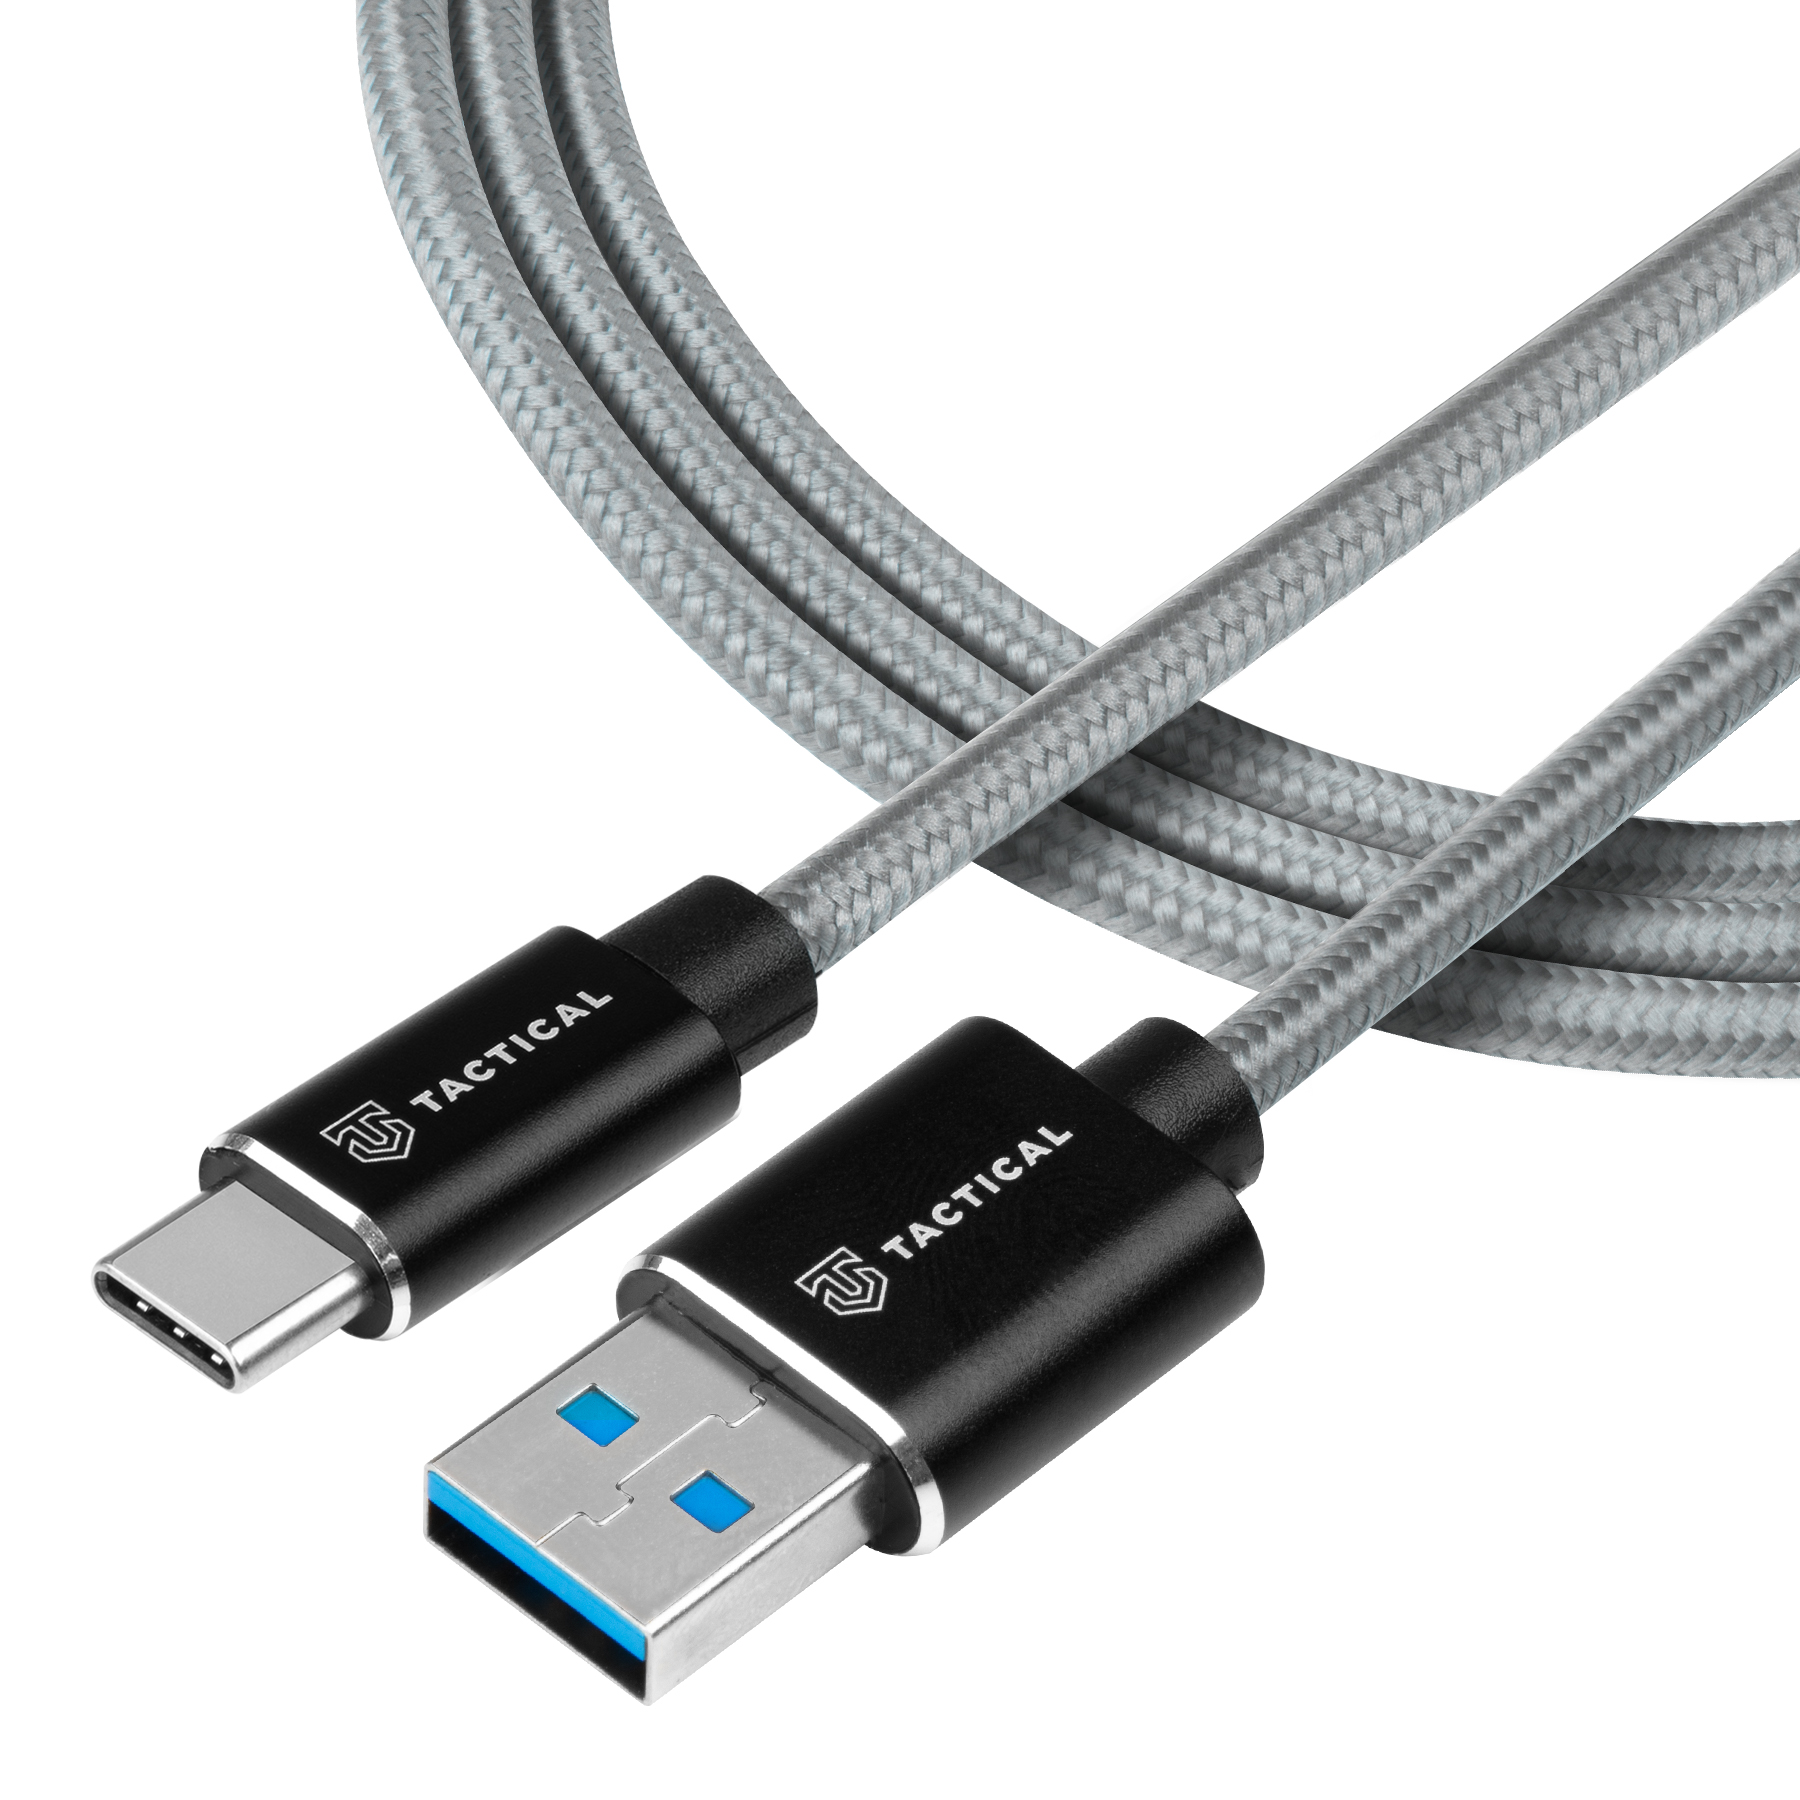 Tactical Fast Rope Aramid Cable USB-A/USB-C 0.3m Grey 8596311153105